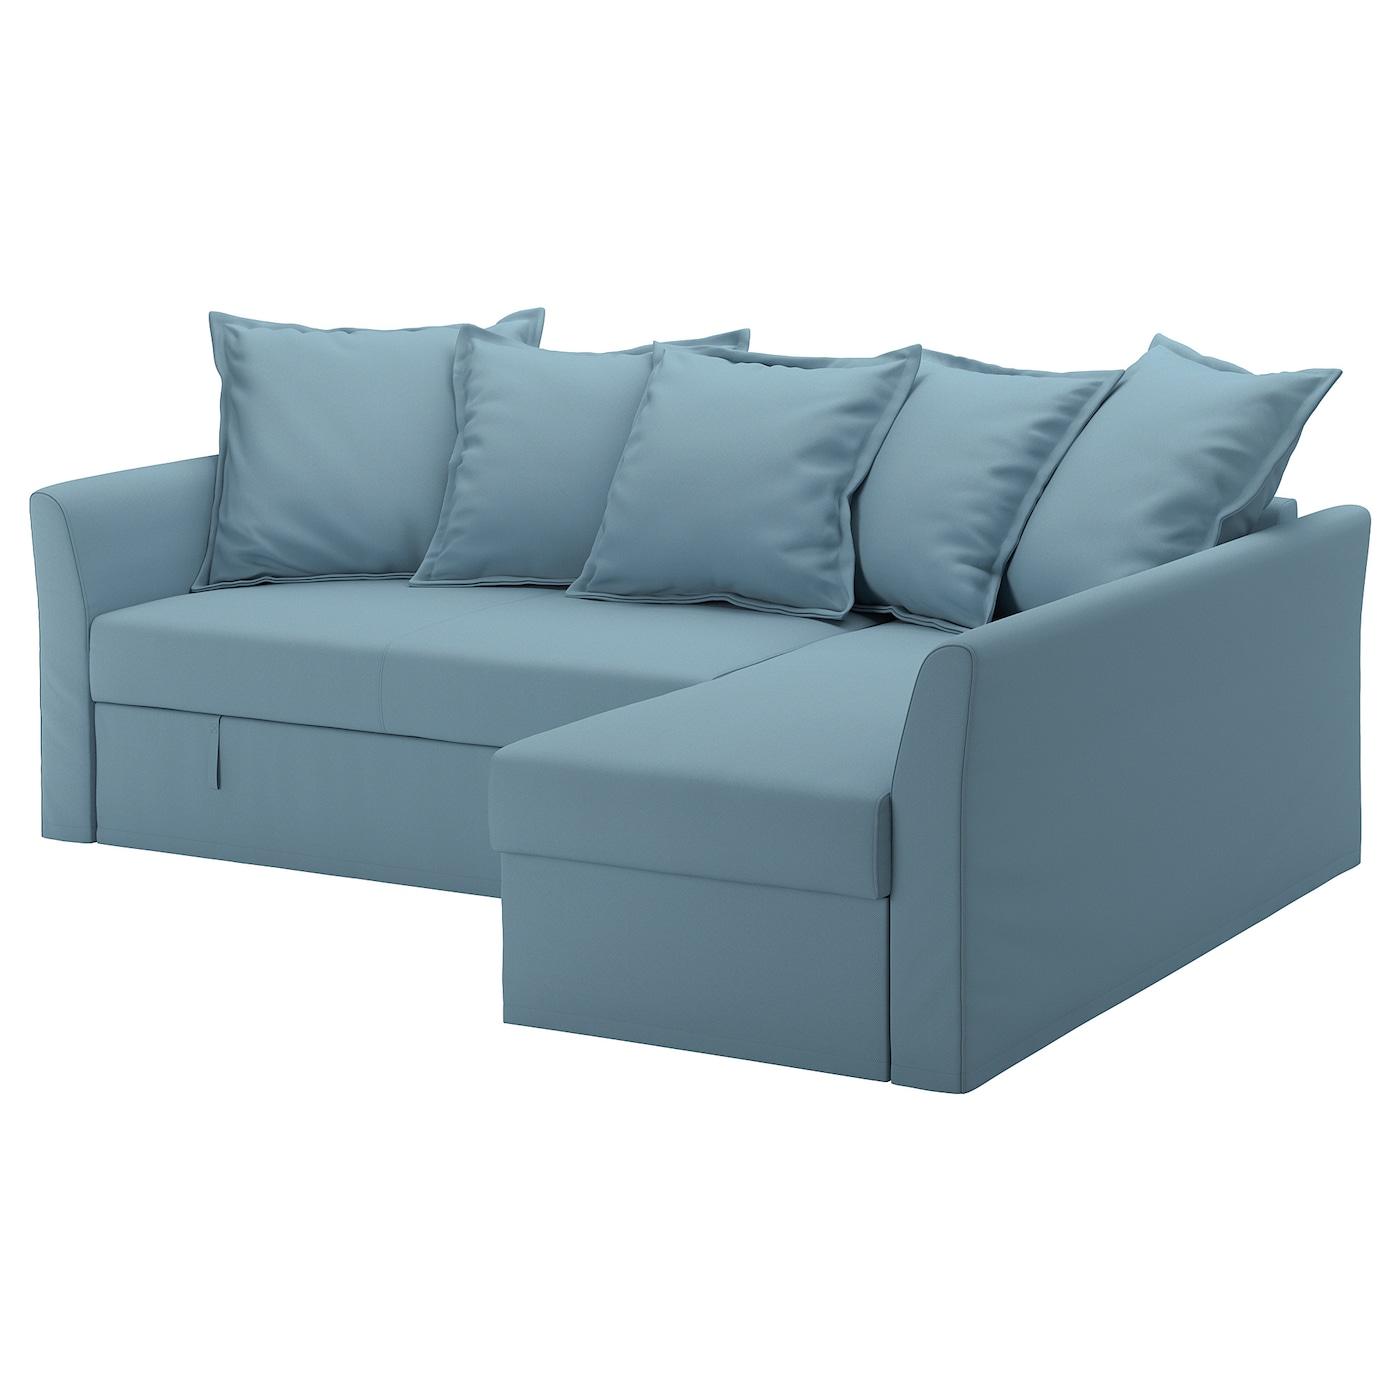 Ikea Armchair Bed: HOLMSUND Corner Sofa-bed Gräsbo Light Blue